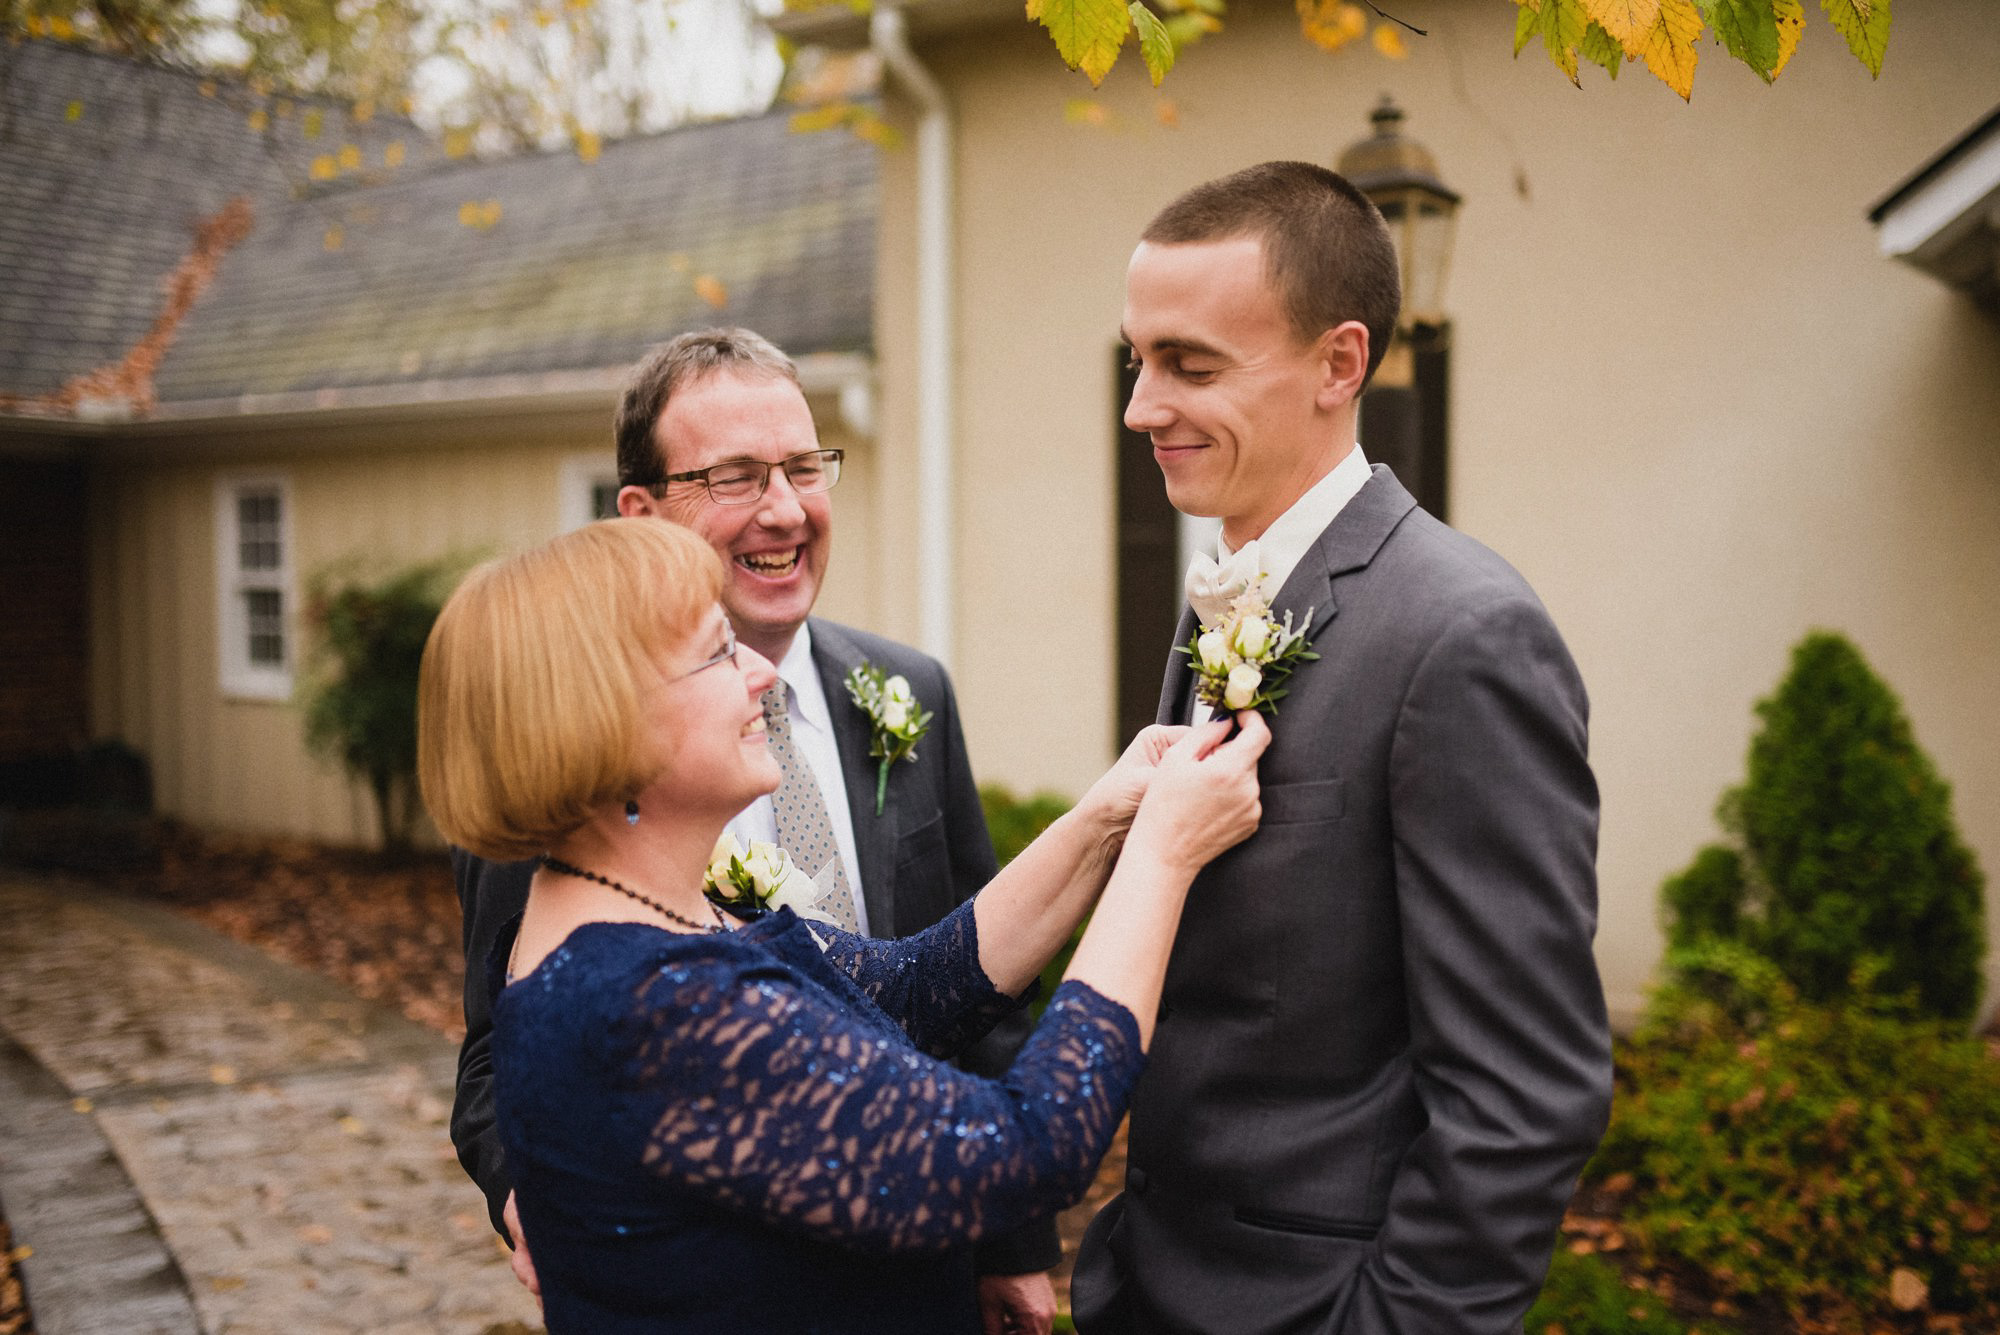 wedding-photography-virginia_0012.jpg